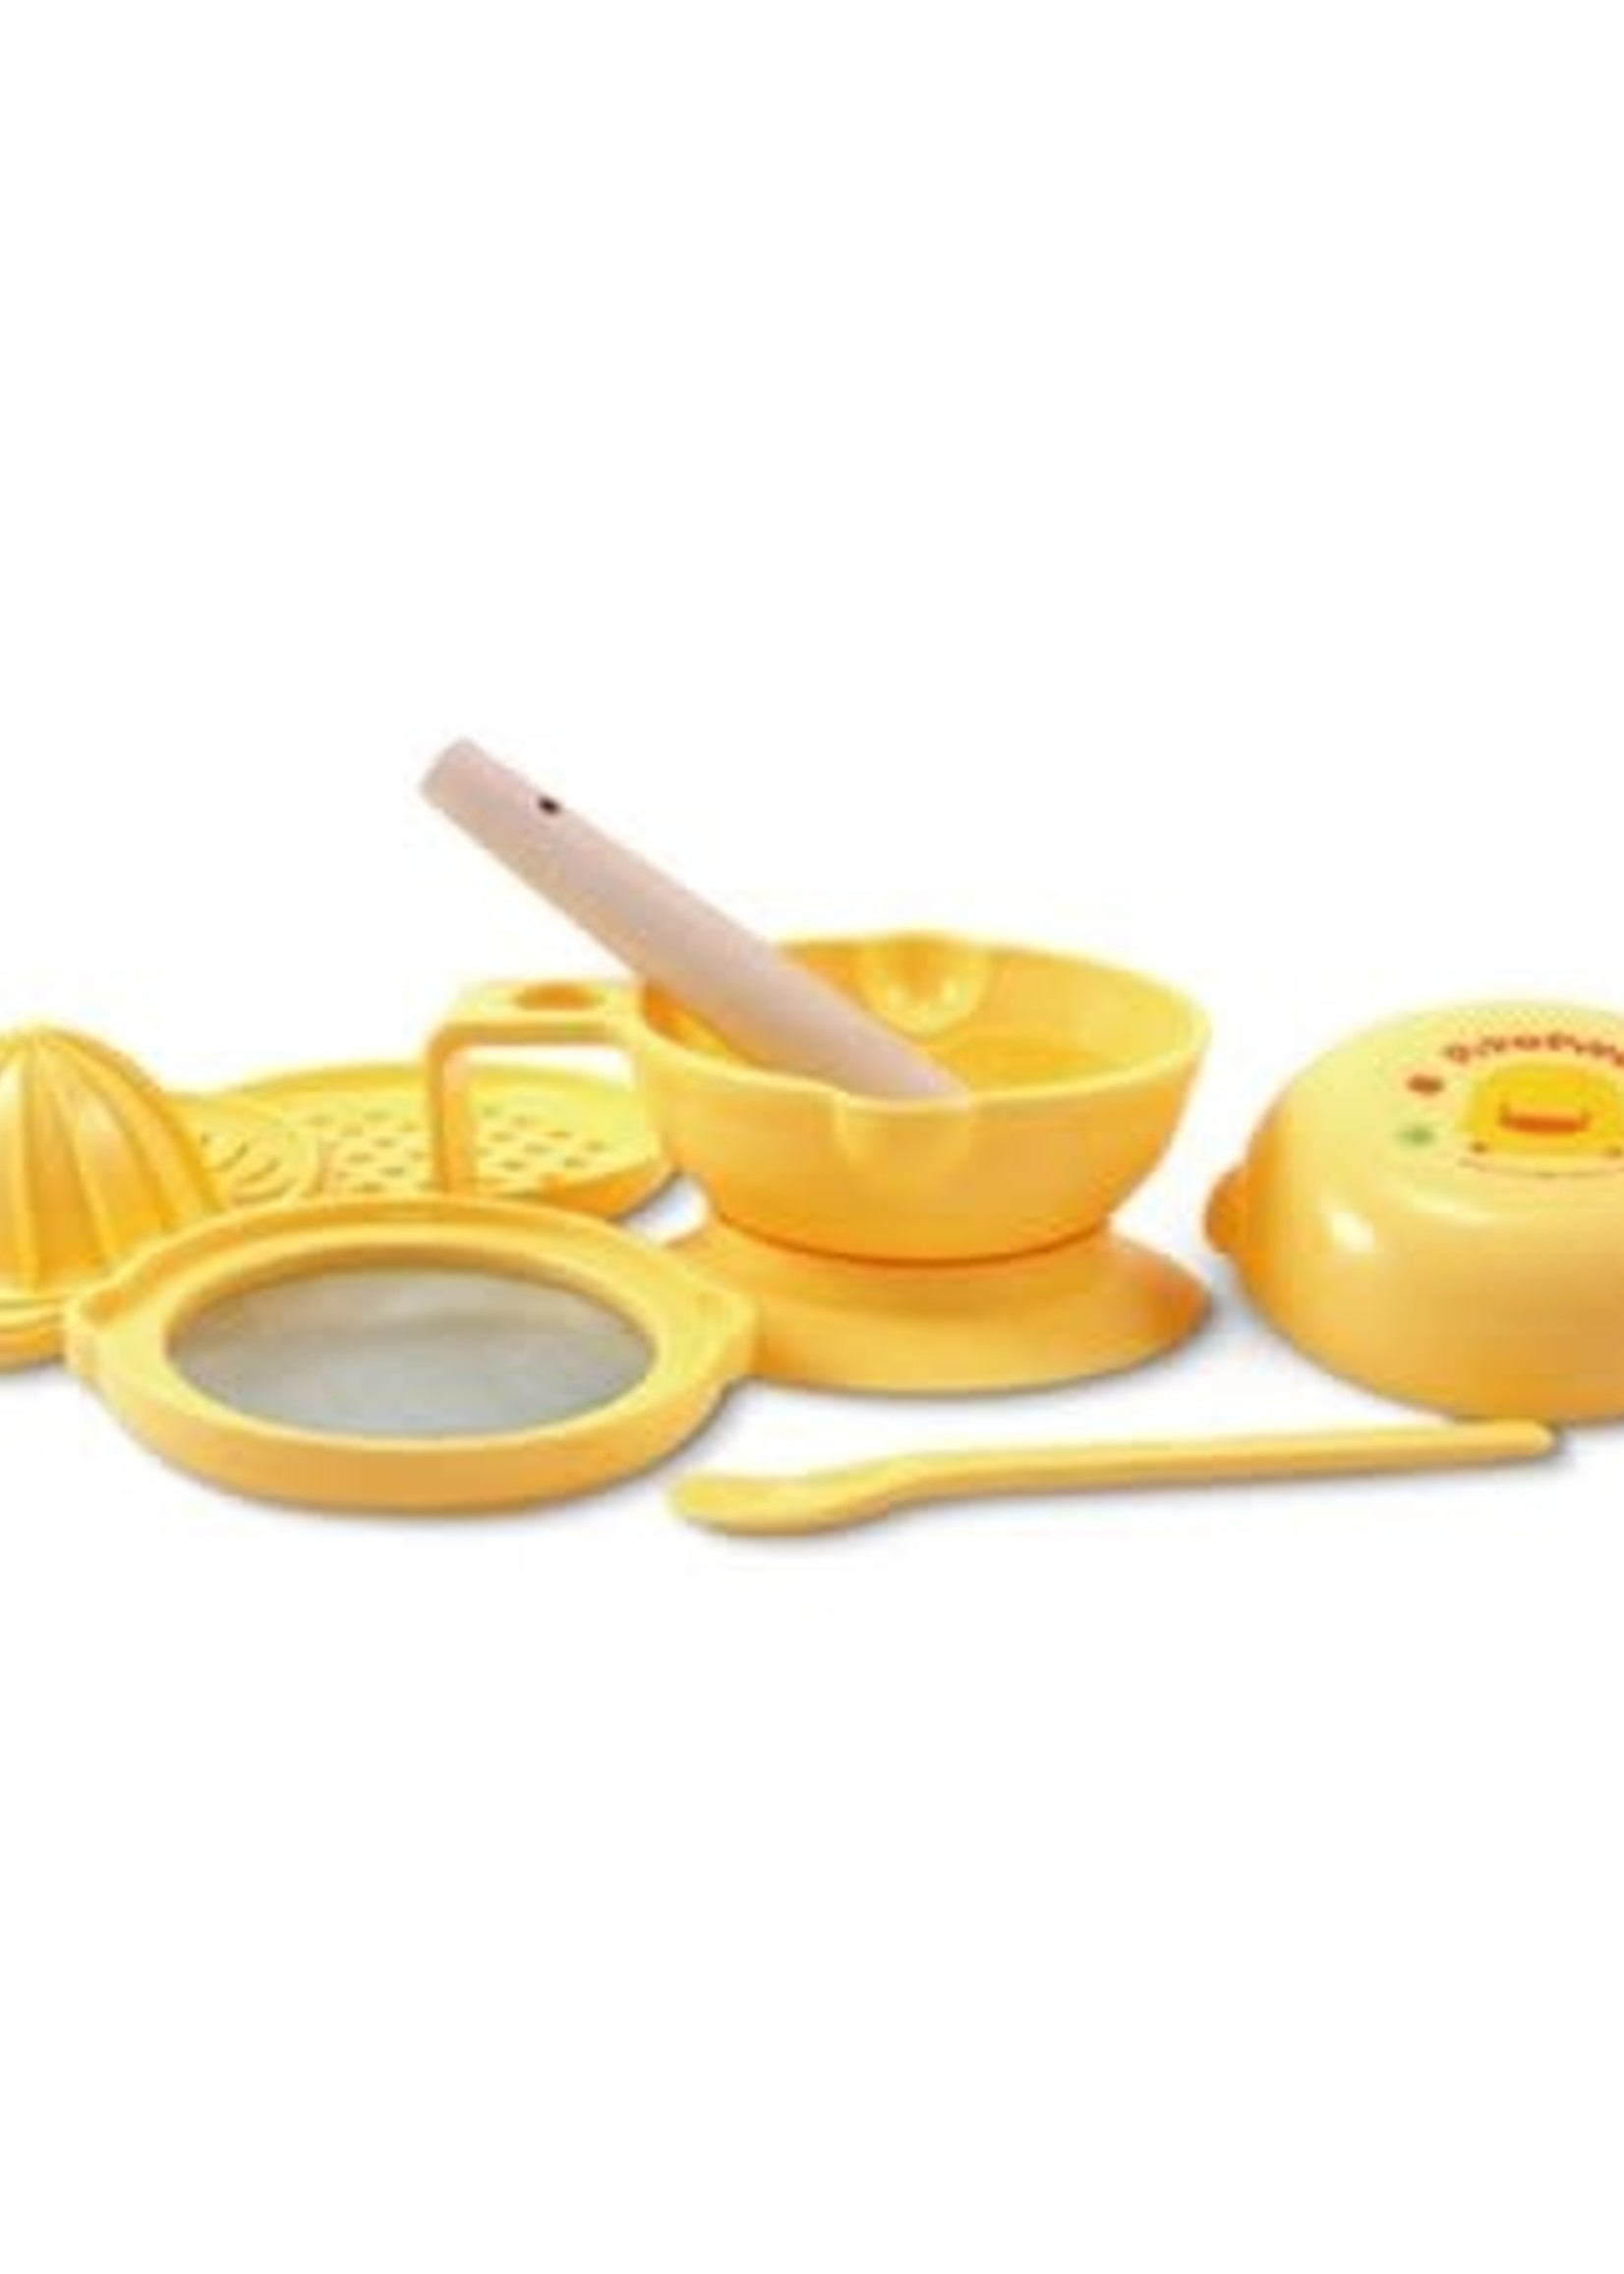 PiyoPiyo PiyoPiyo 7 piece  Baby Food Processor Set